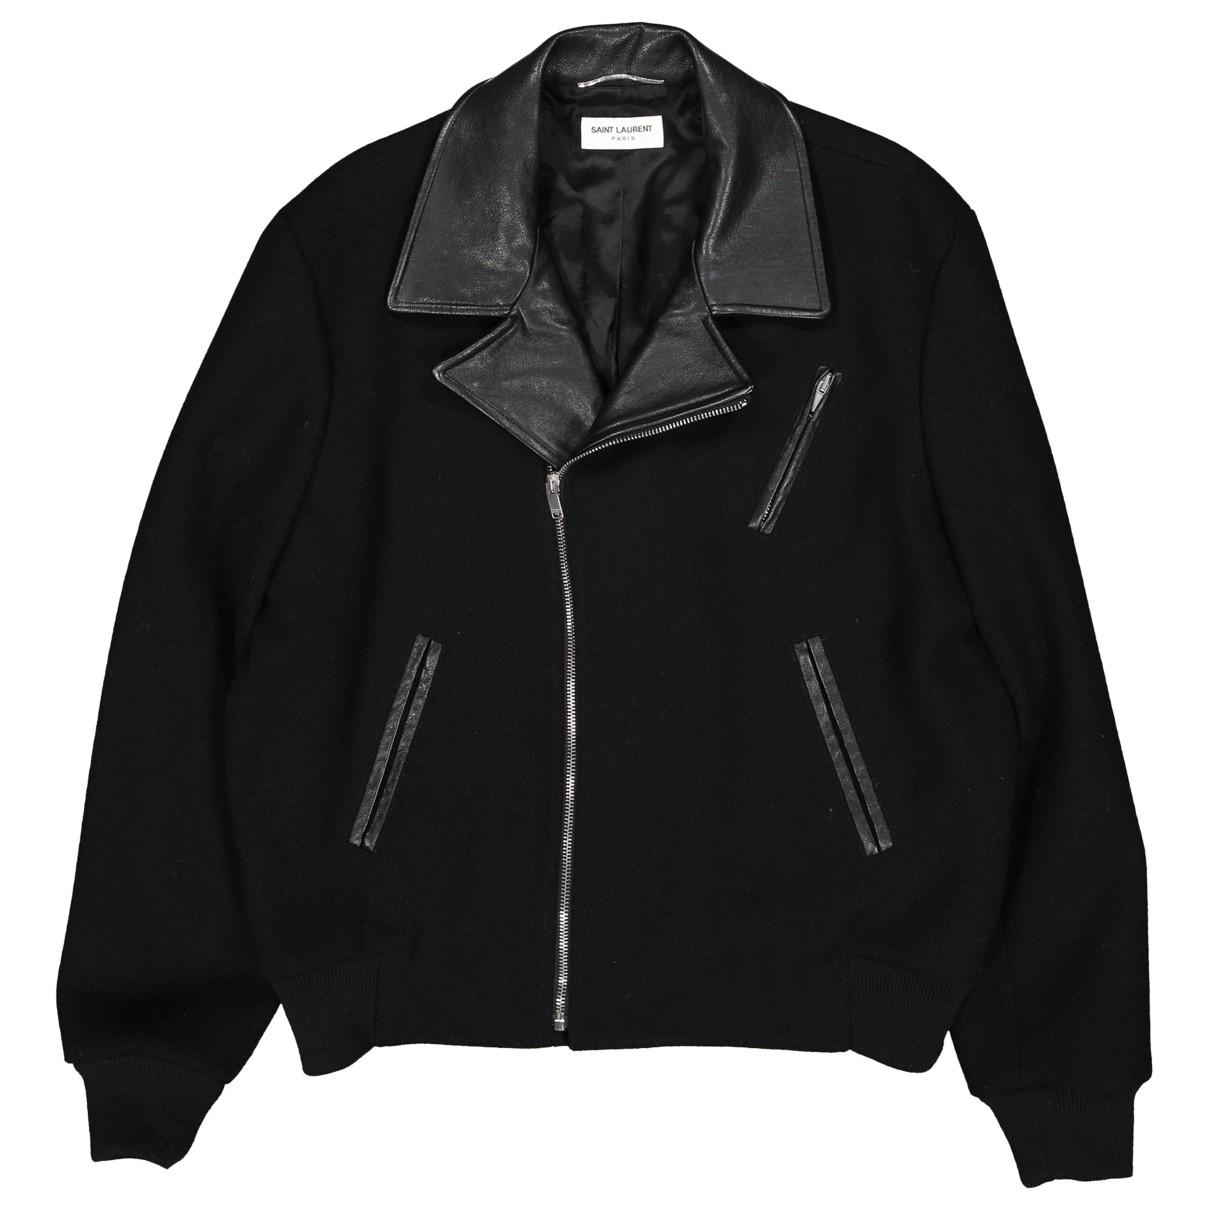 Saint Laurent \N Black Wool jacket  for Men 50-52 IT